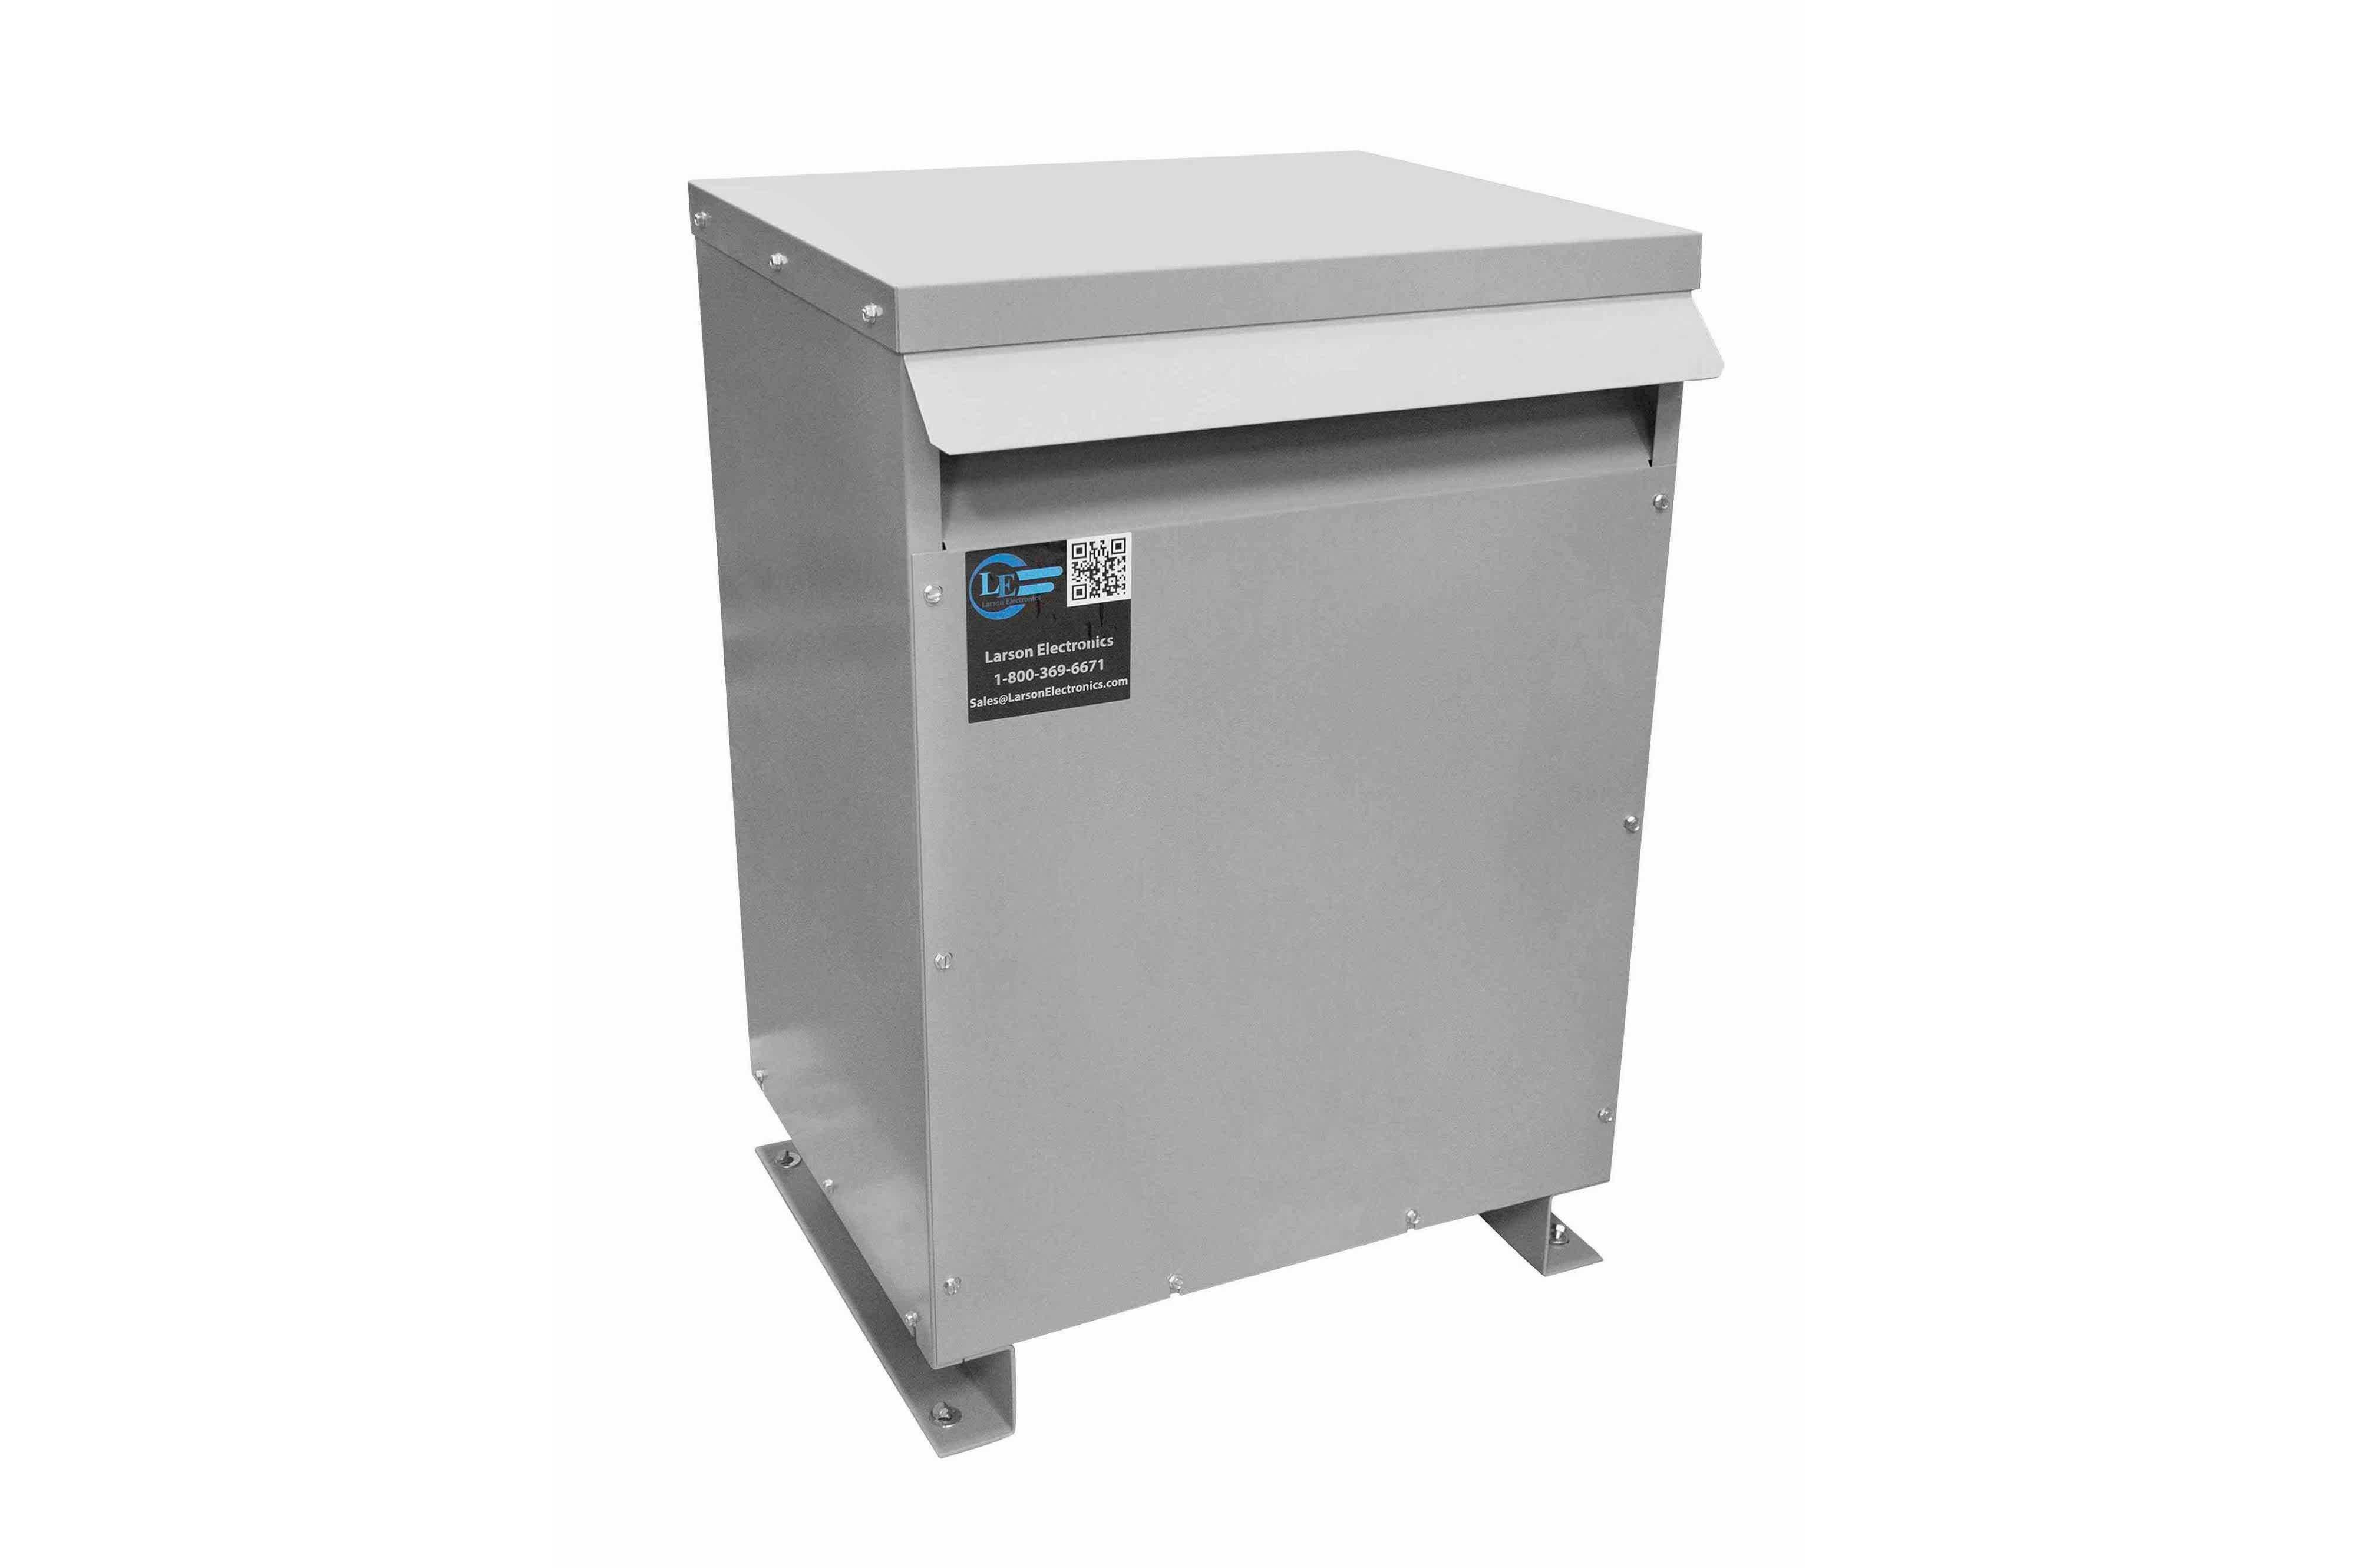 9 kVA 3PH Isolation Transformer, 240V Wye Primary, 400Y/231 Wye-N Secondary, N3R, Ventilated, 60 Hz